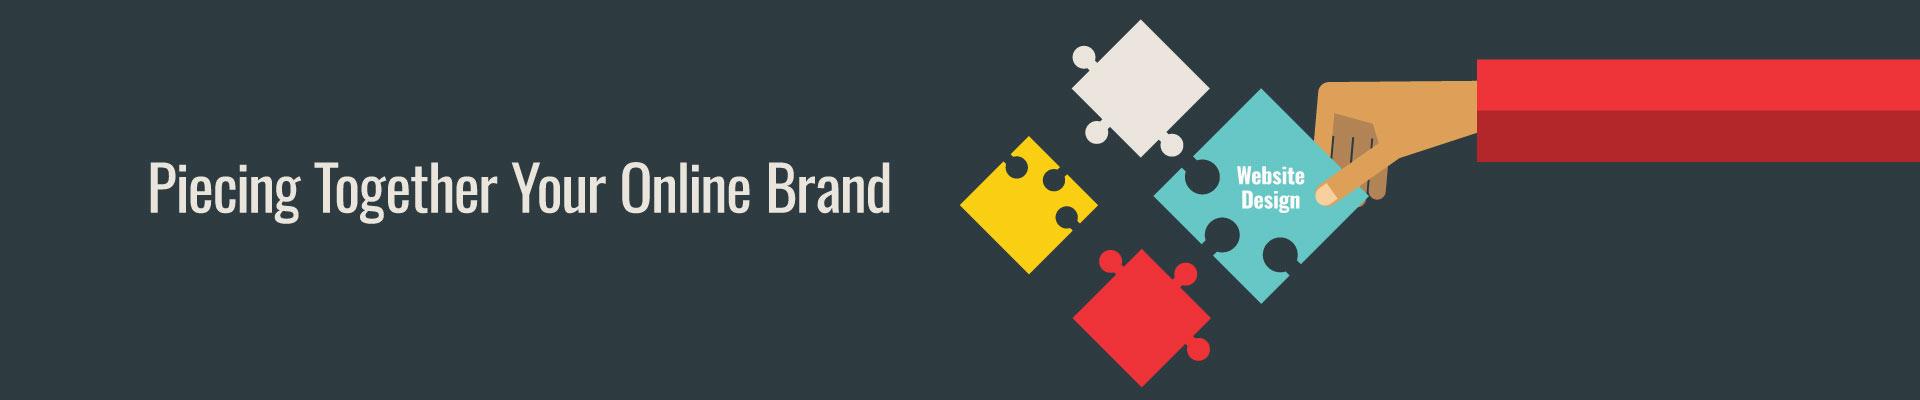 Piecing Together Your Online Brand 1 Orthopreneur Internet Marketing